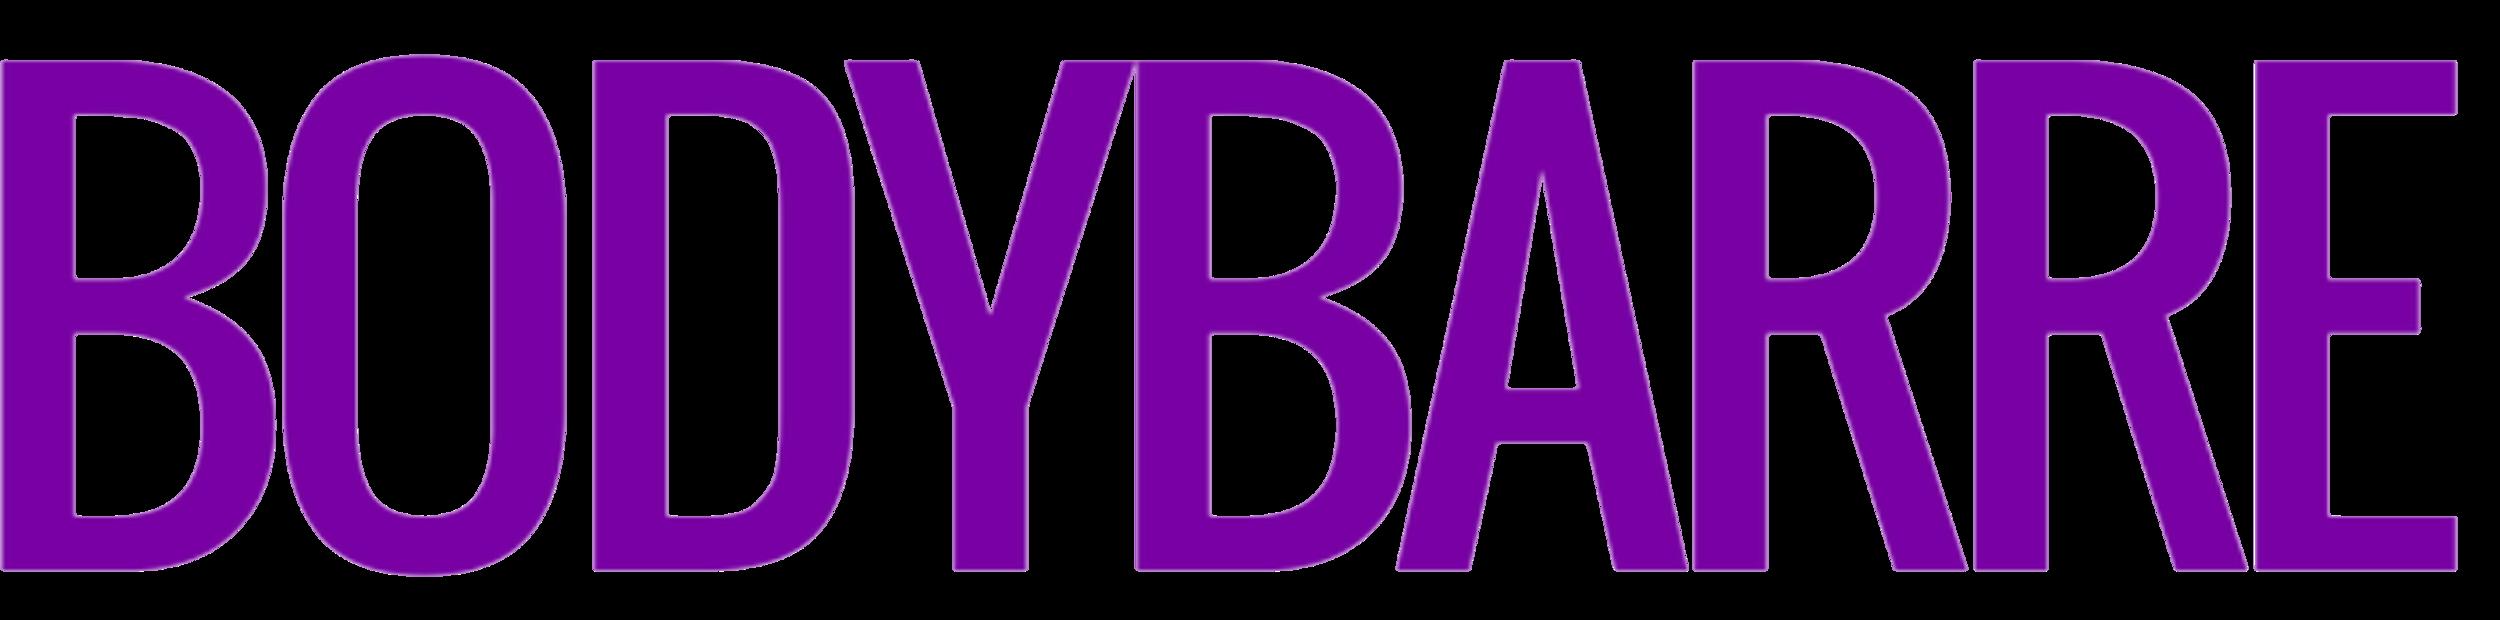 BodyBarre Lettering, No B's